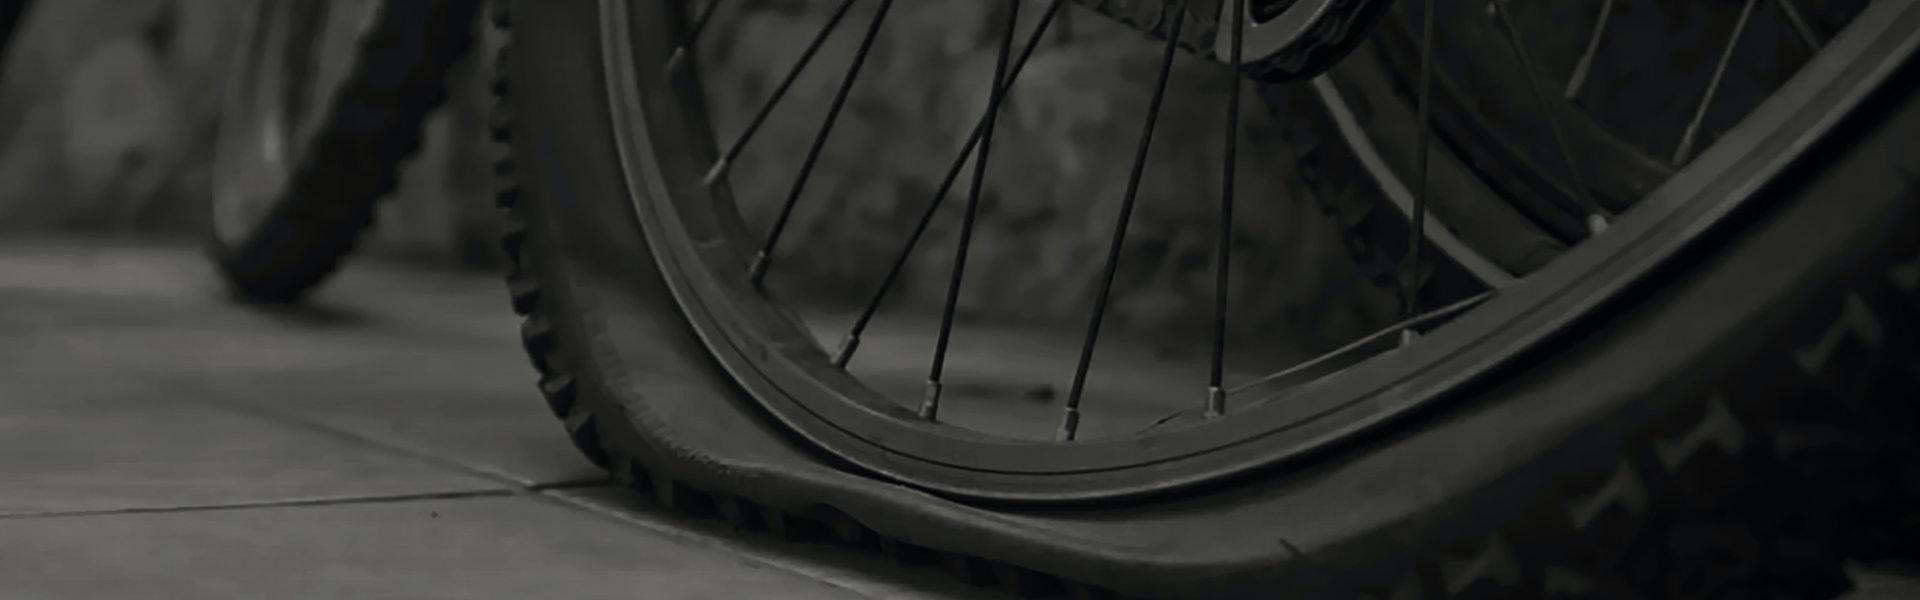 Sistemas Antipinchazos para Bicicleta